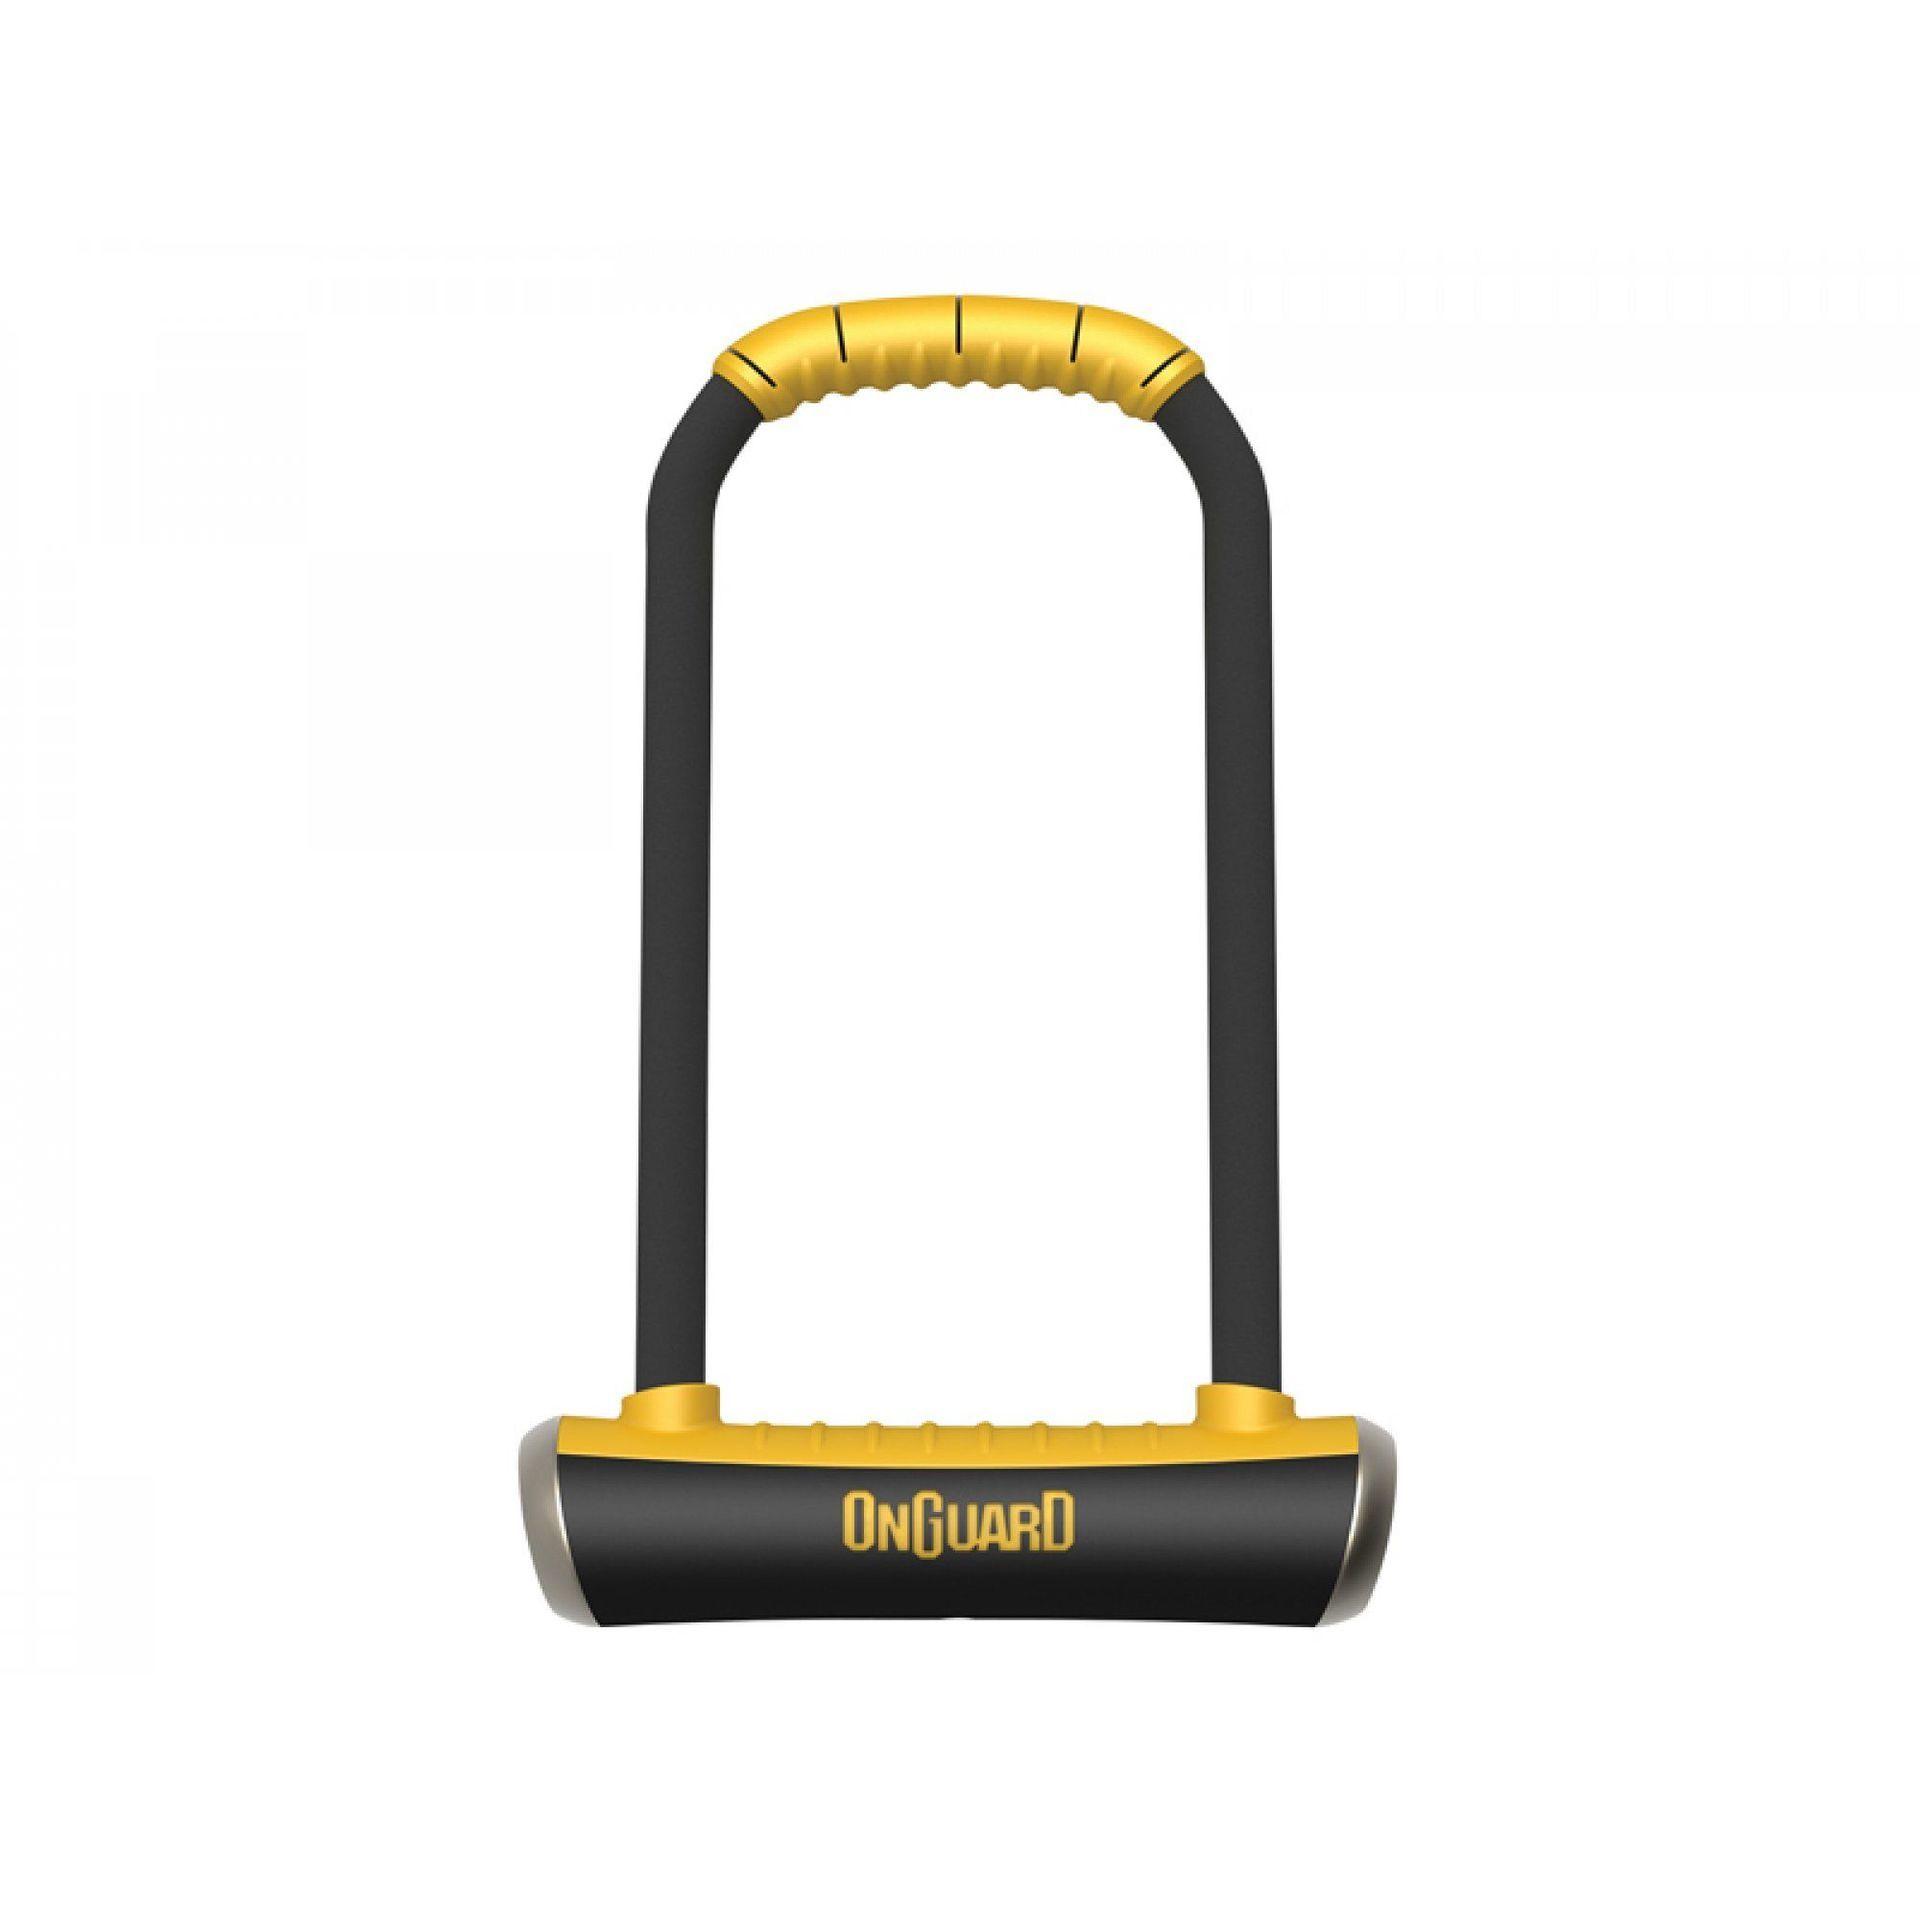 ZAPIĘCIE ROWEROWE ONGUARD PITBULL LS 8002 BLACK